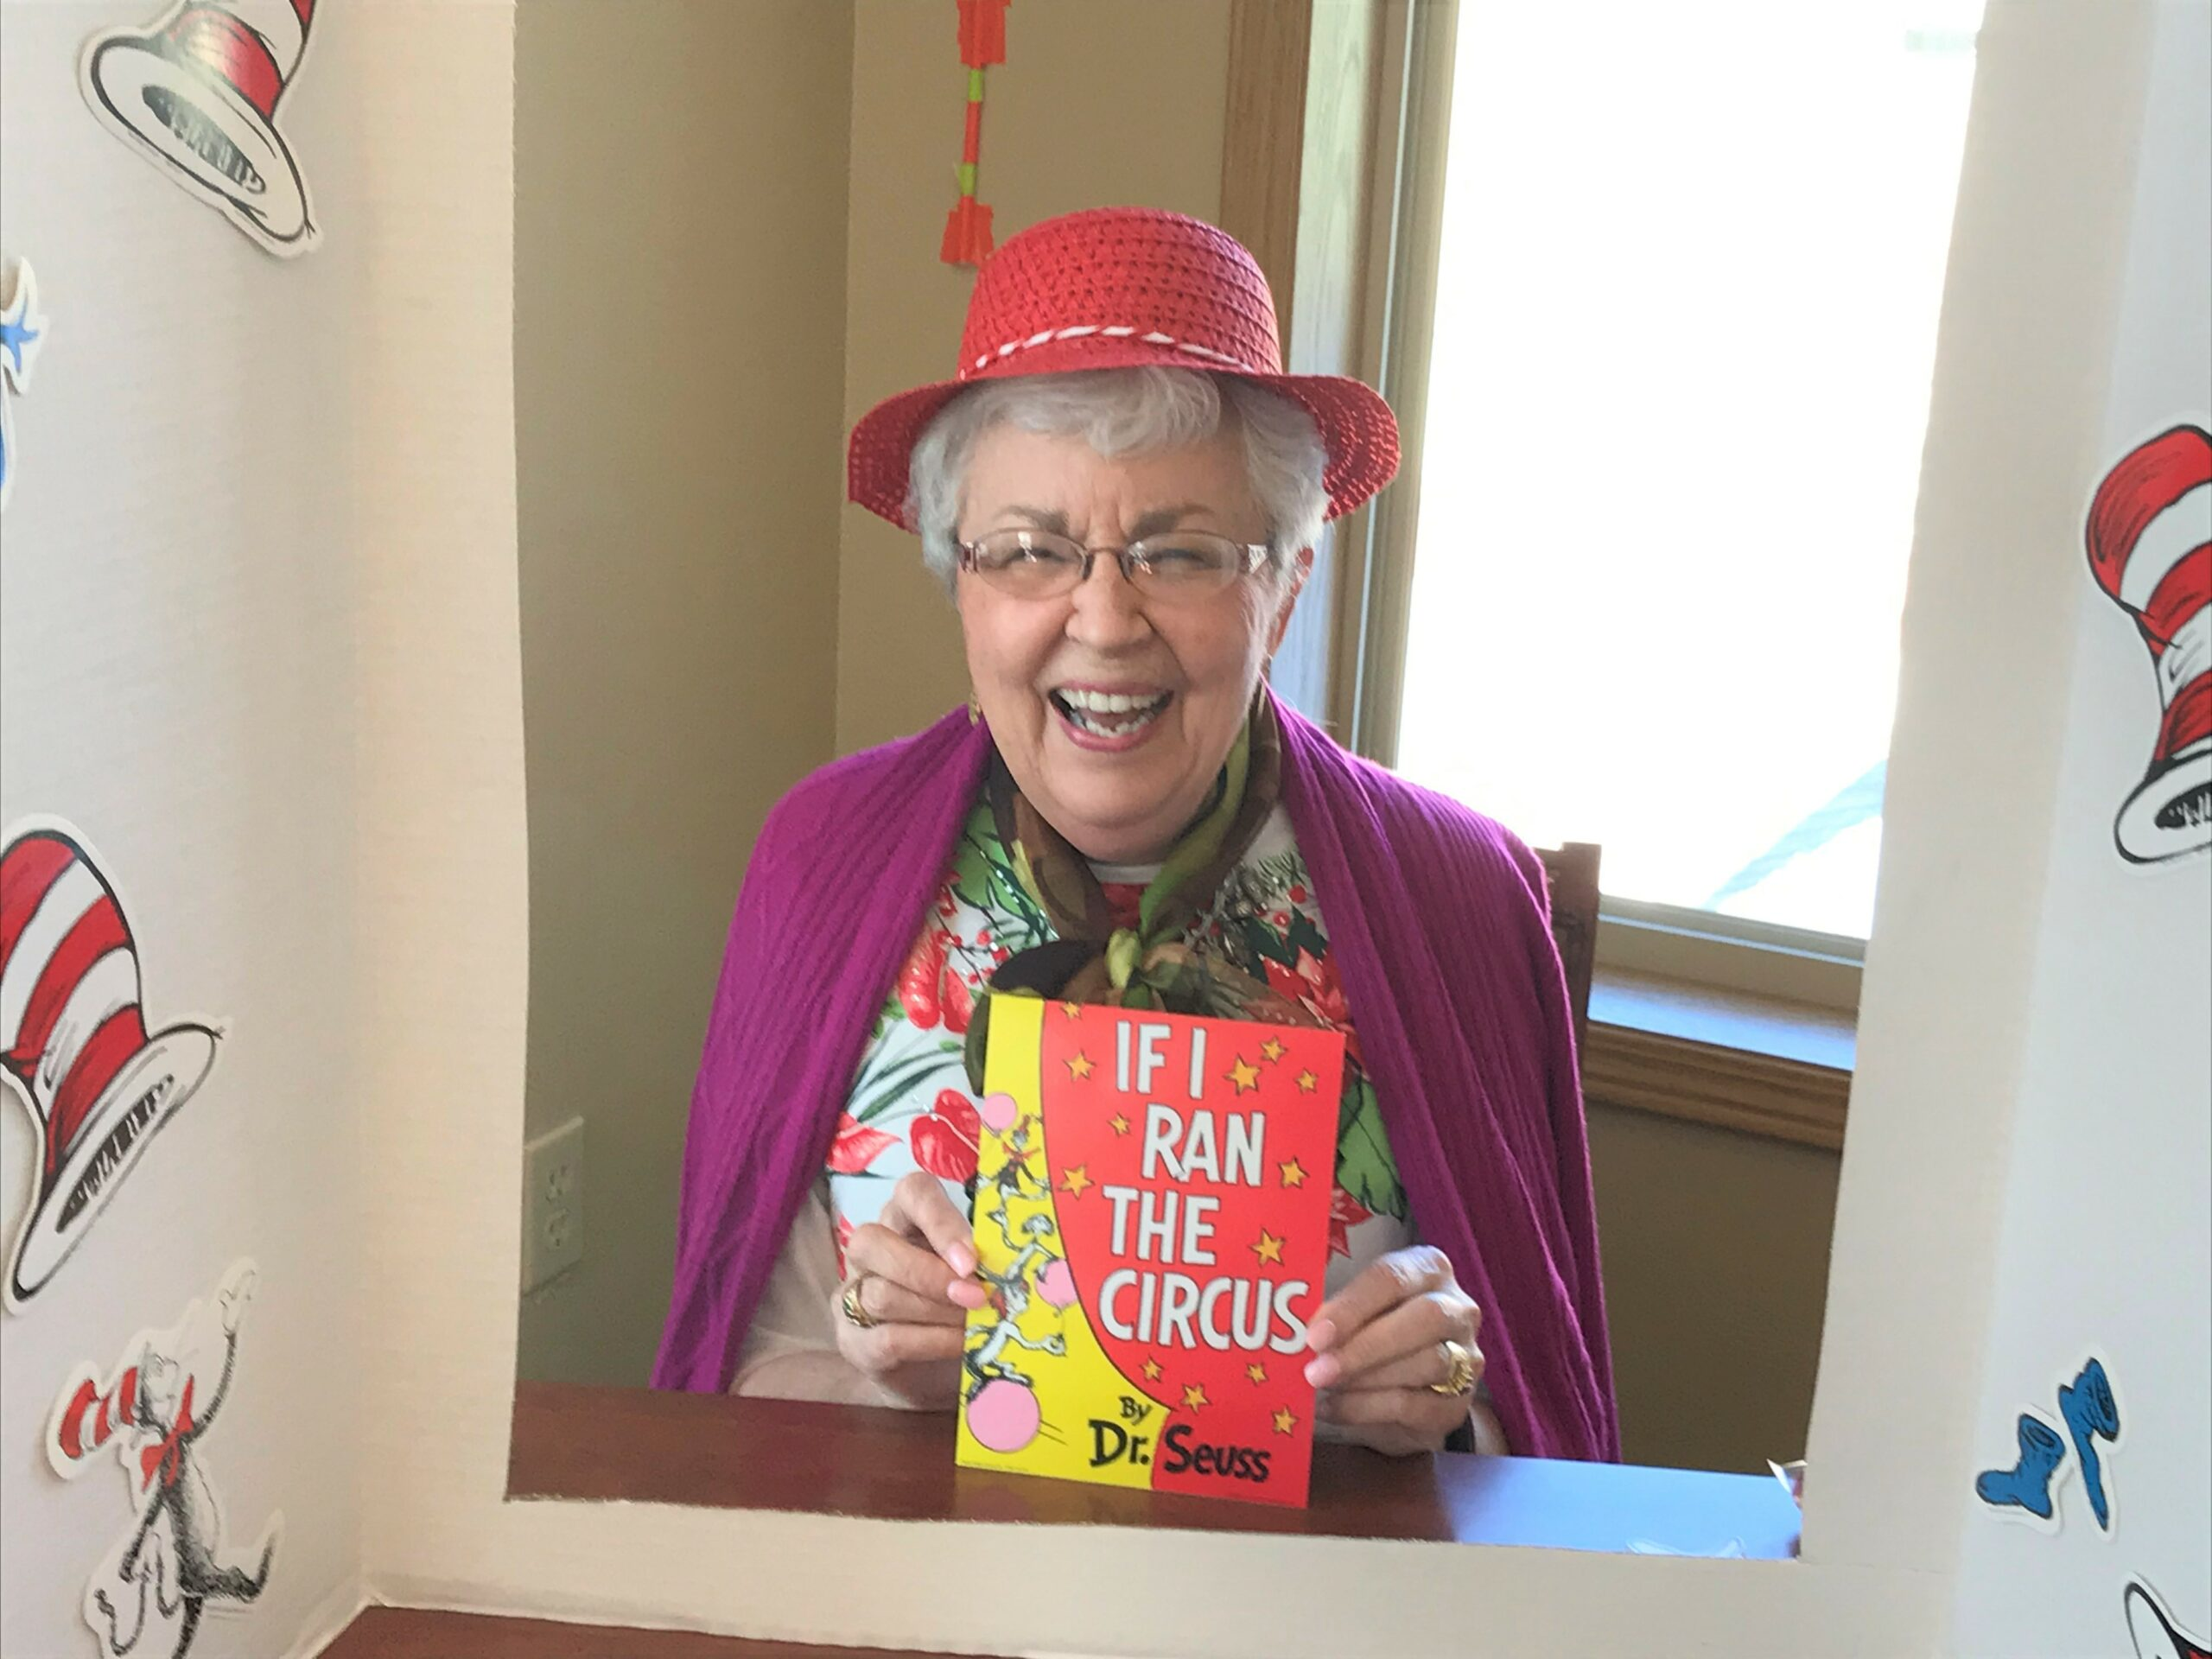 Happy Birthday Dr. Seuss! Judy enjoying the party!